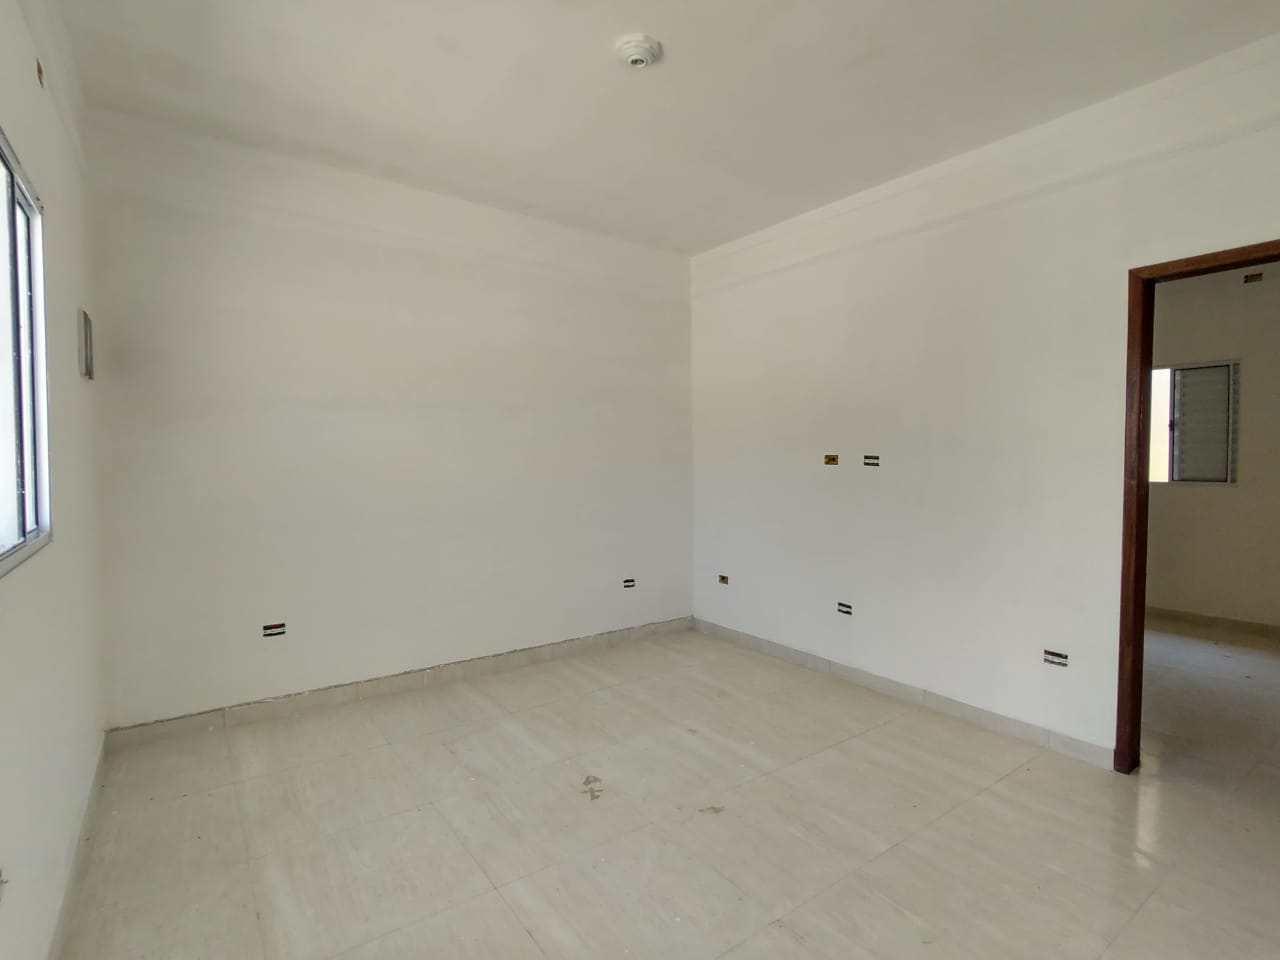 Casa com 2 dorms, Jardim Santa Terezinha, Itanhaém - R$ 369 mil, Cod: 279394